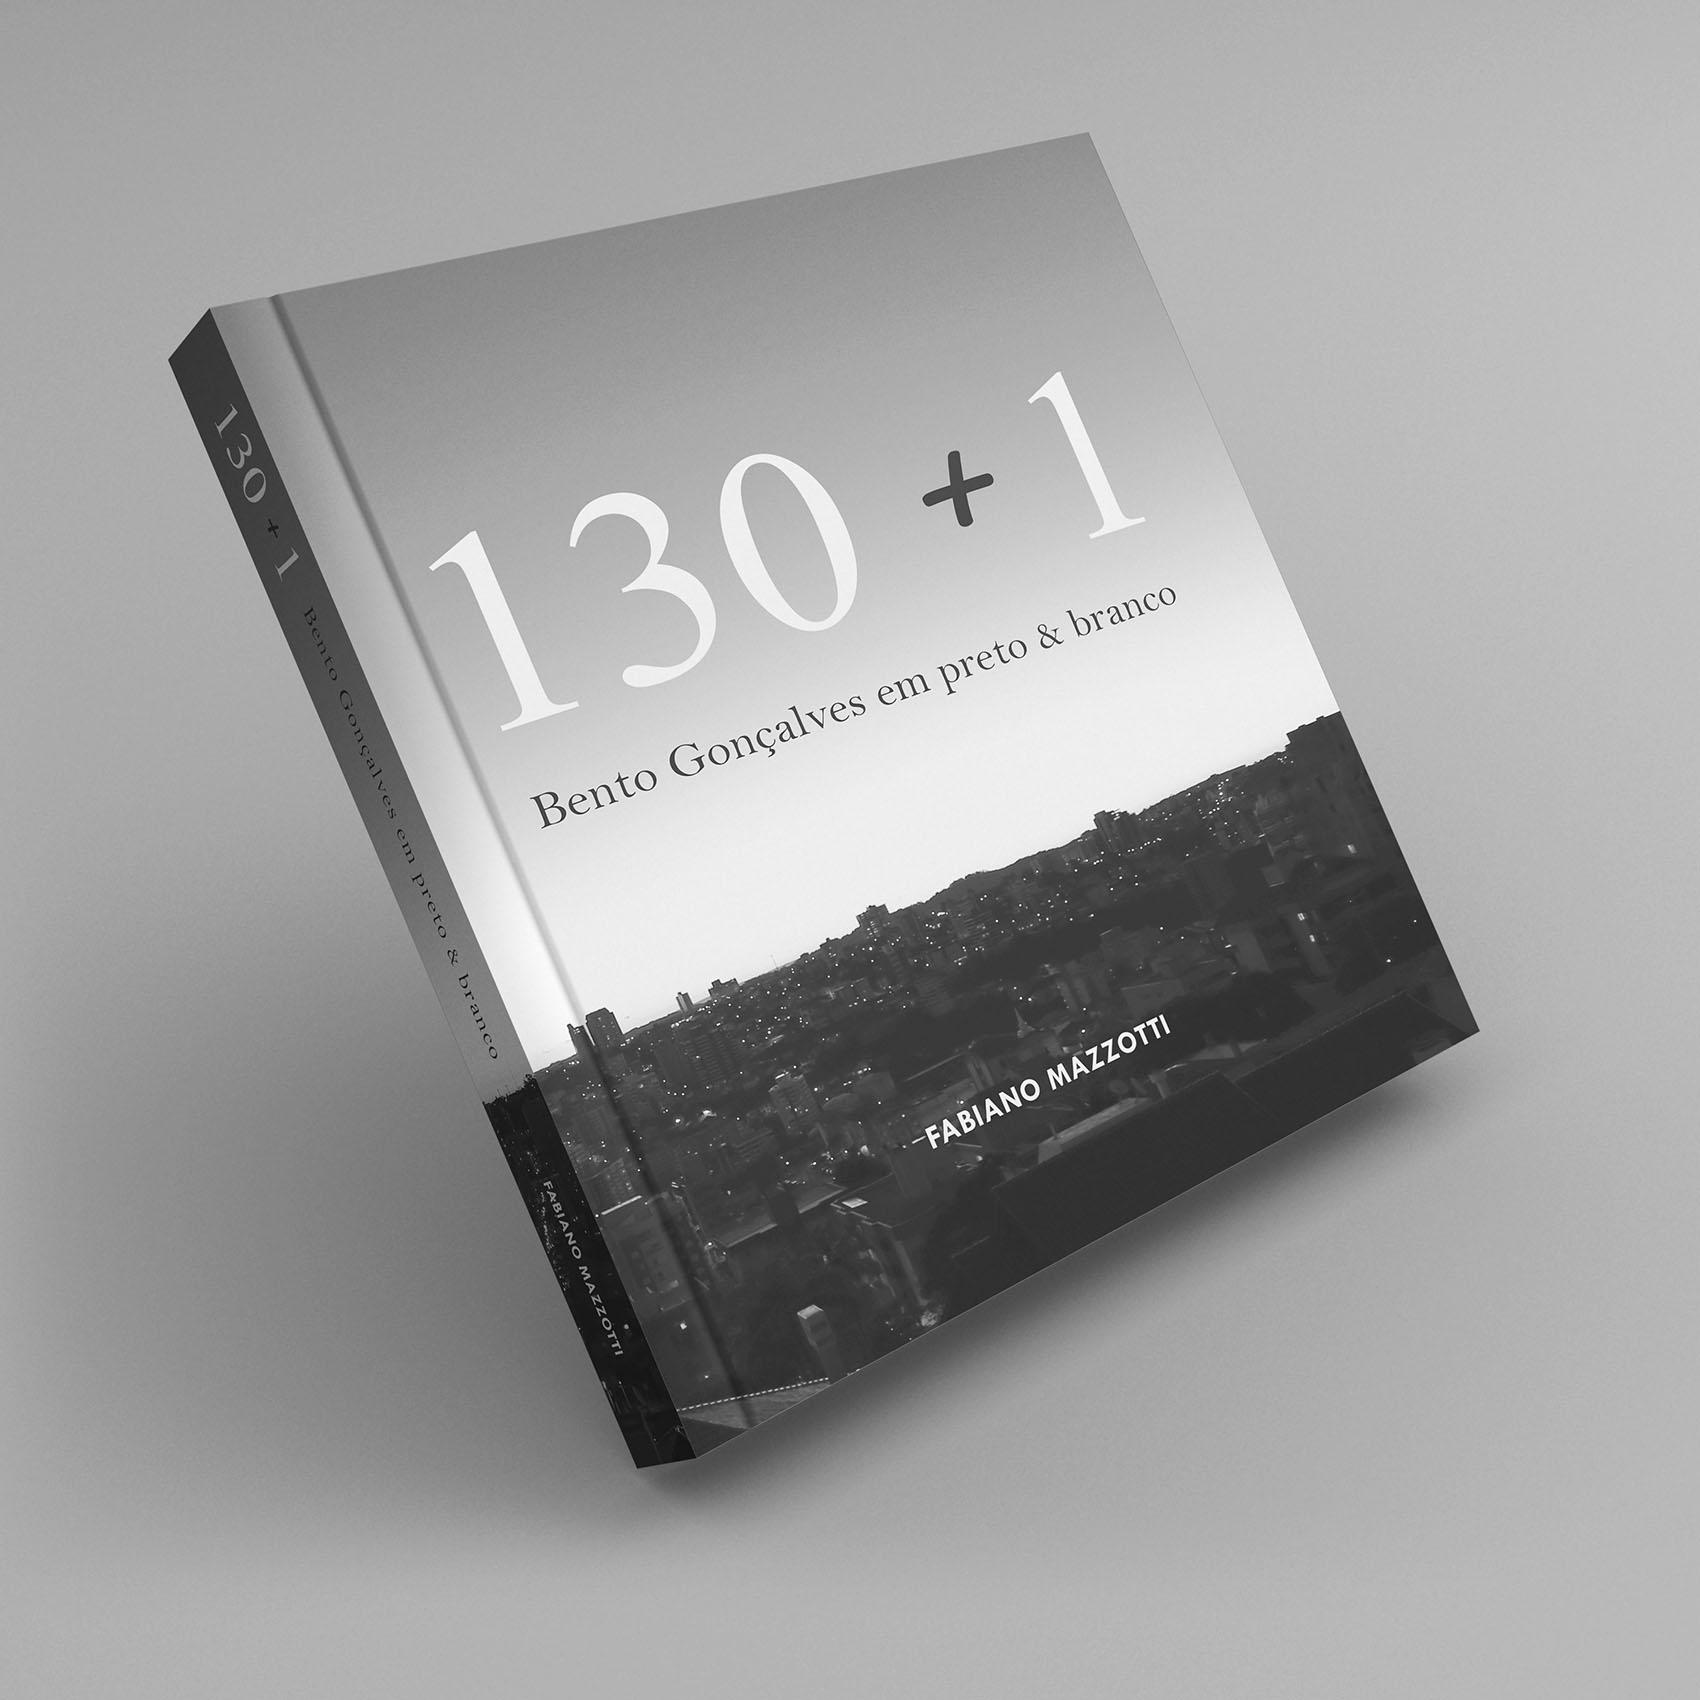 130 + 1